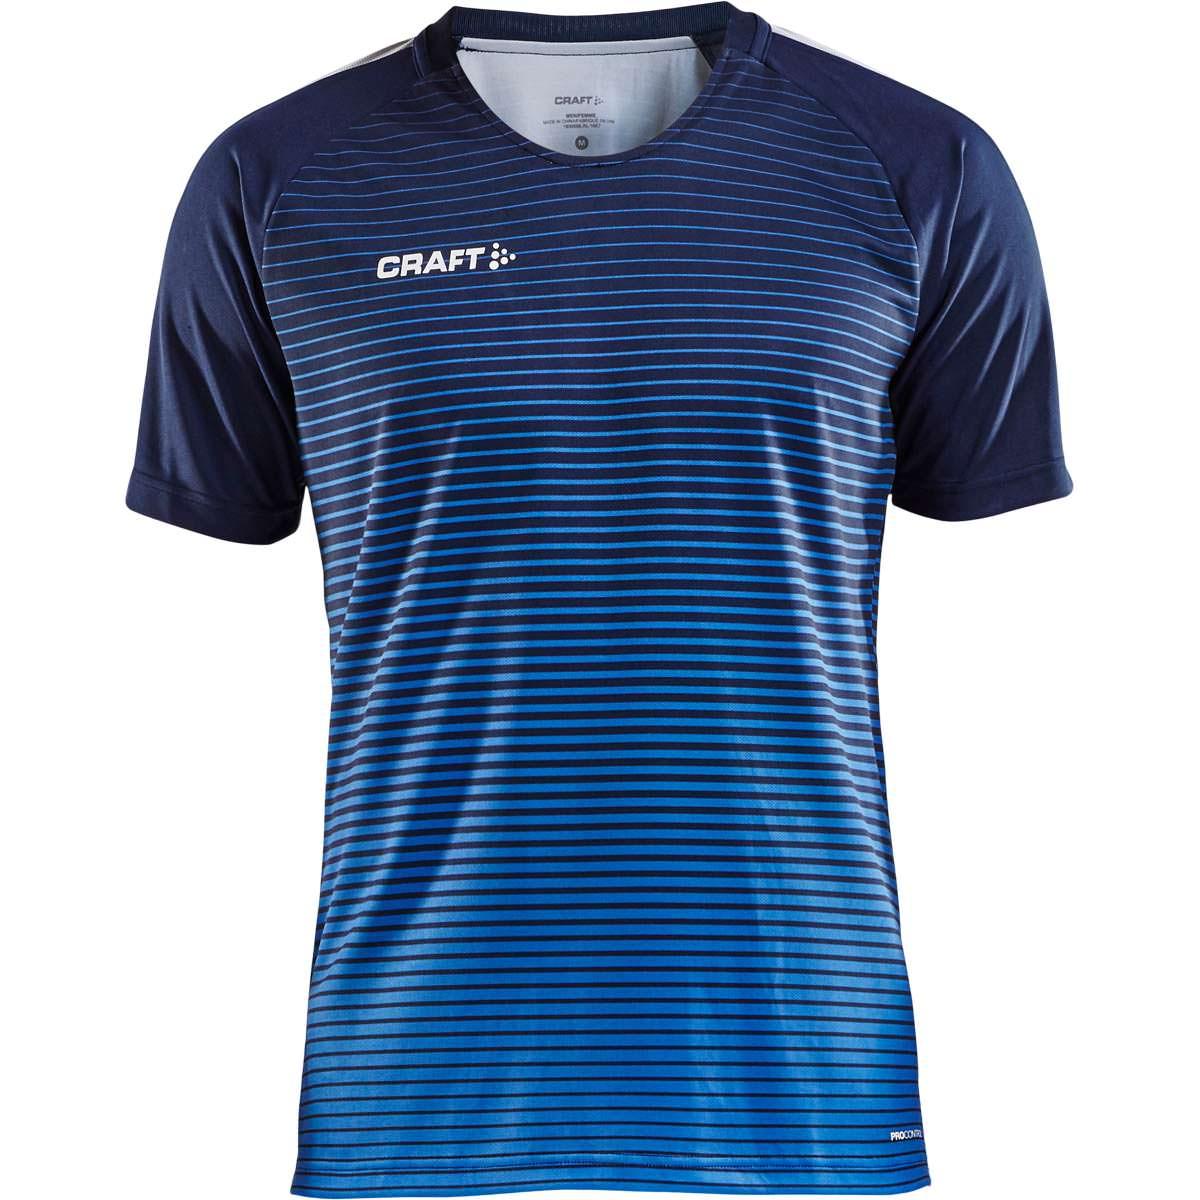 Craft Pro Control Stripe Trænings T-shirt Herre